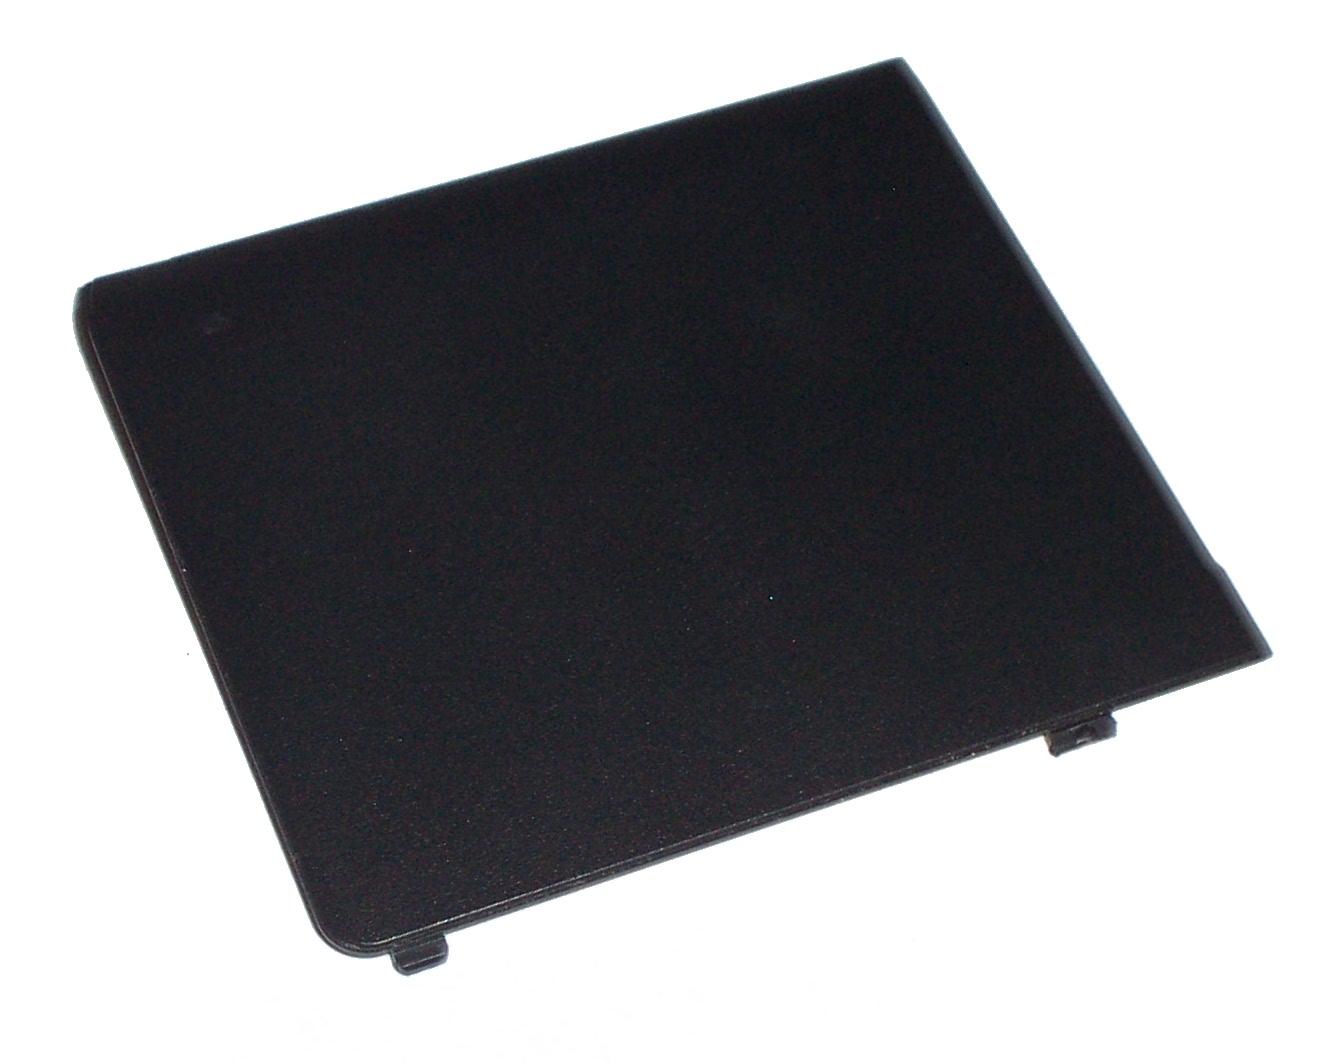 Compaq N610c laptop for windows 7